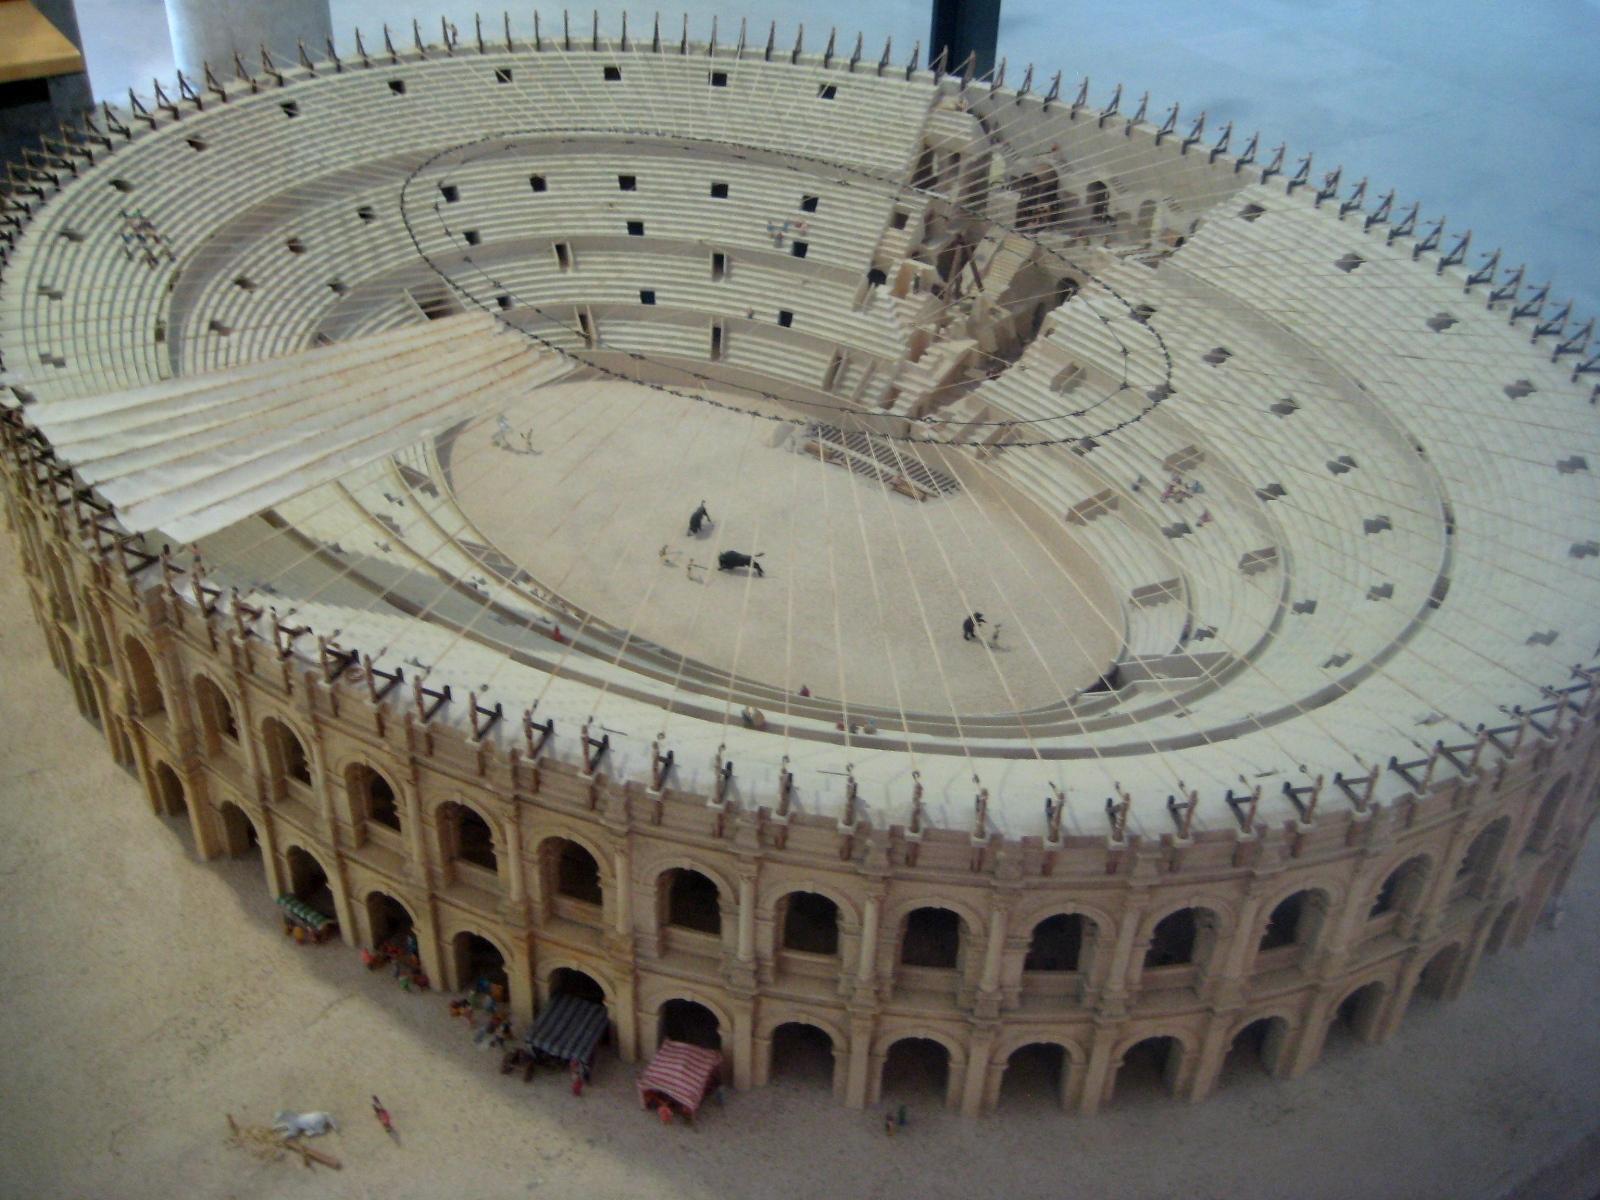 Arles Amphitheatre model